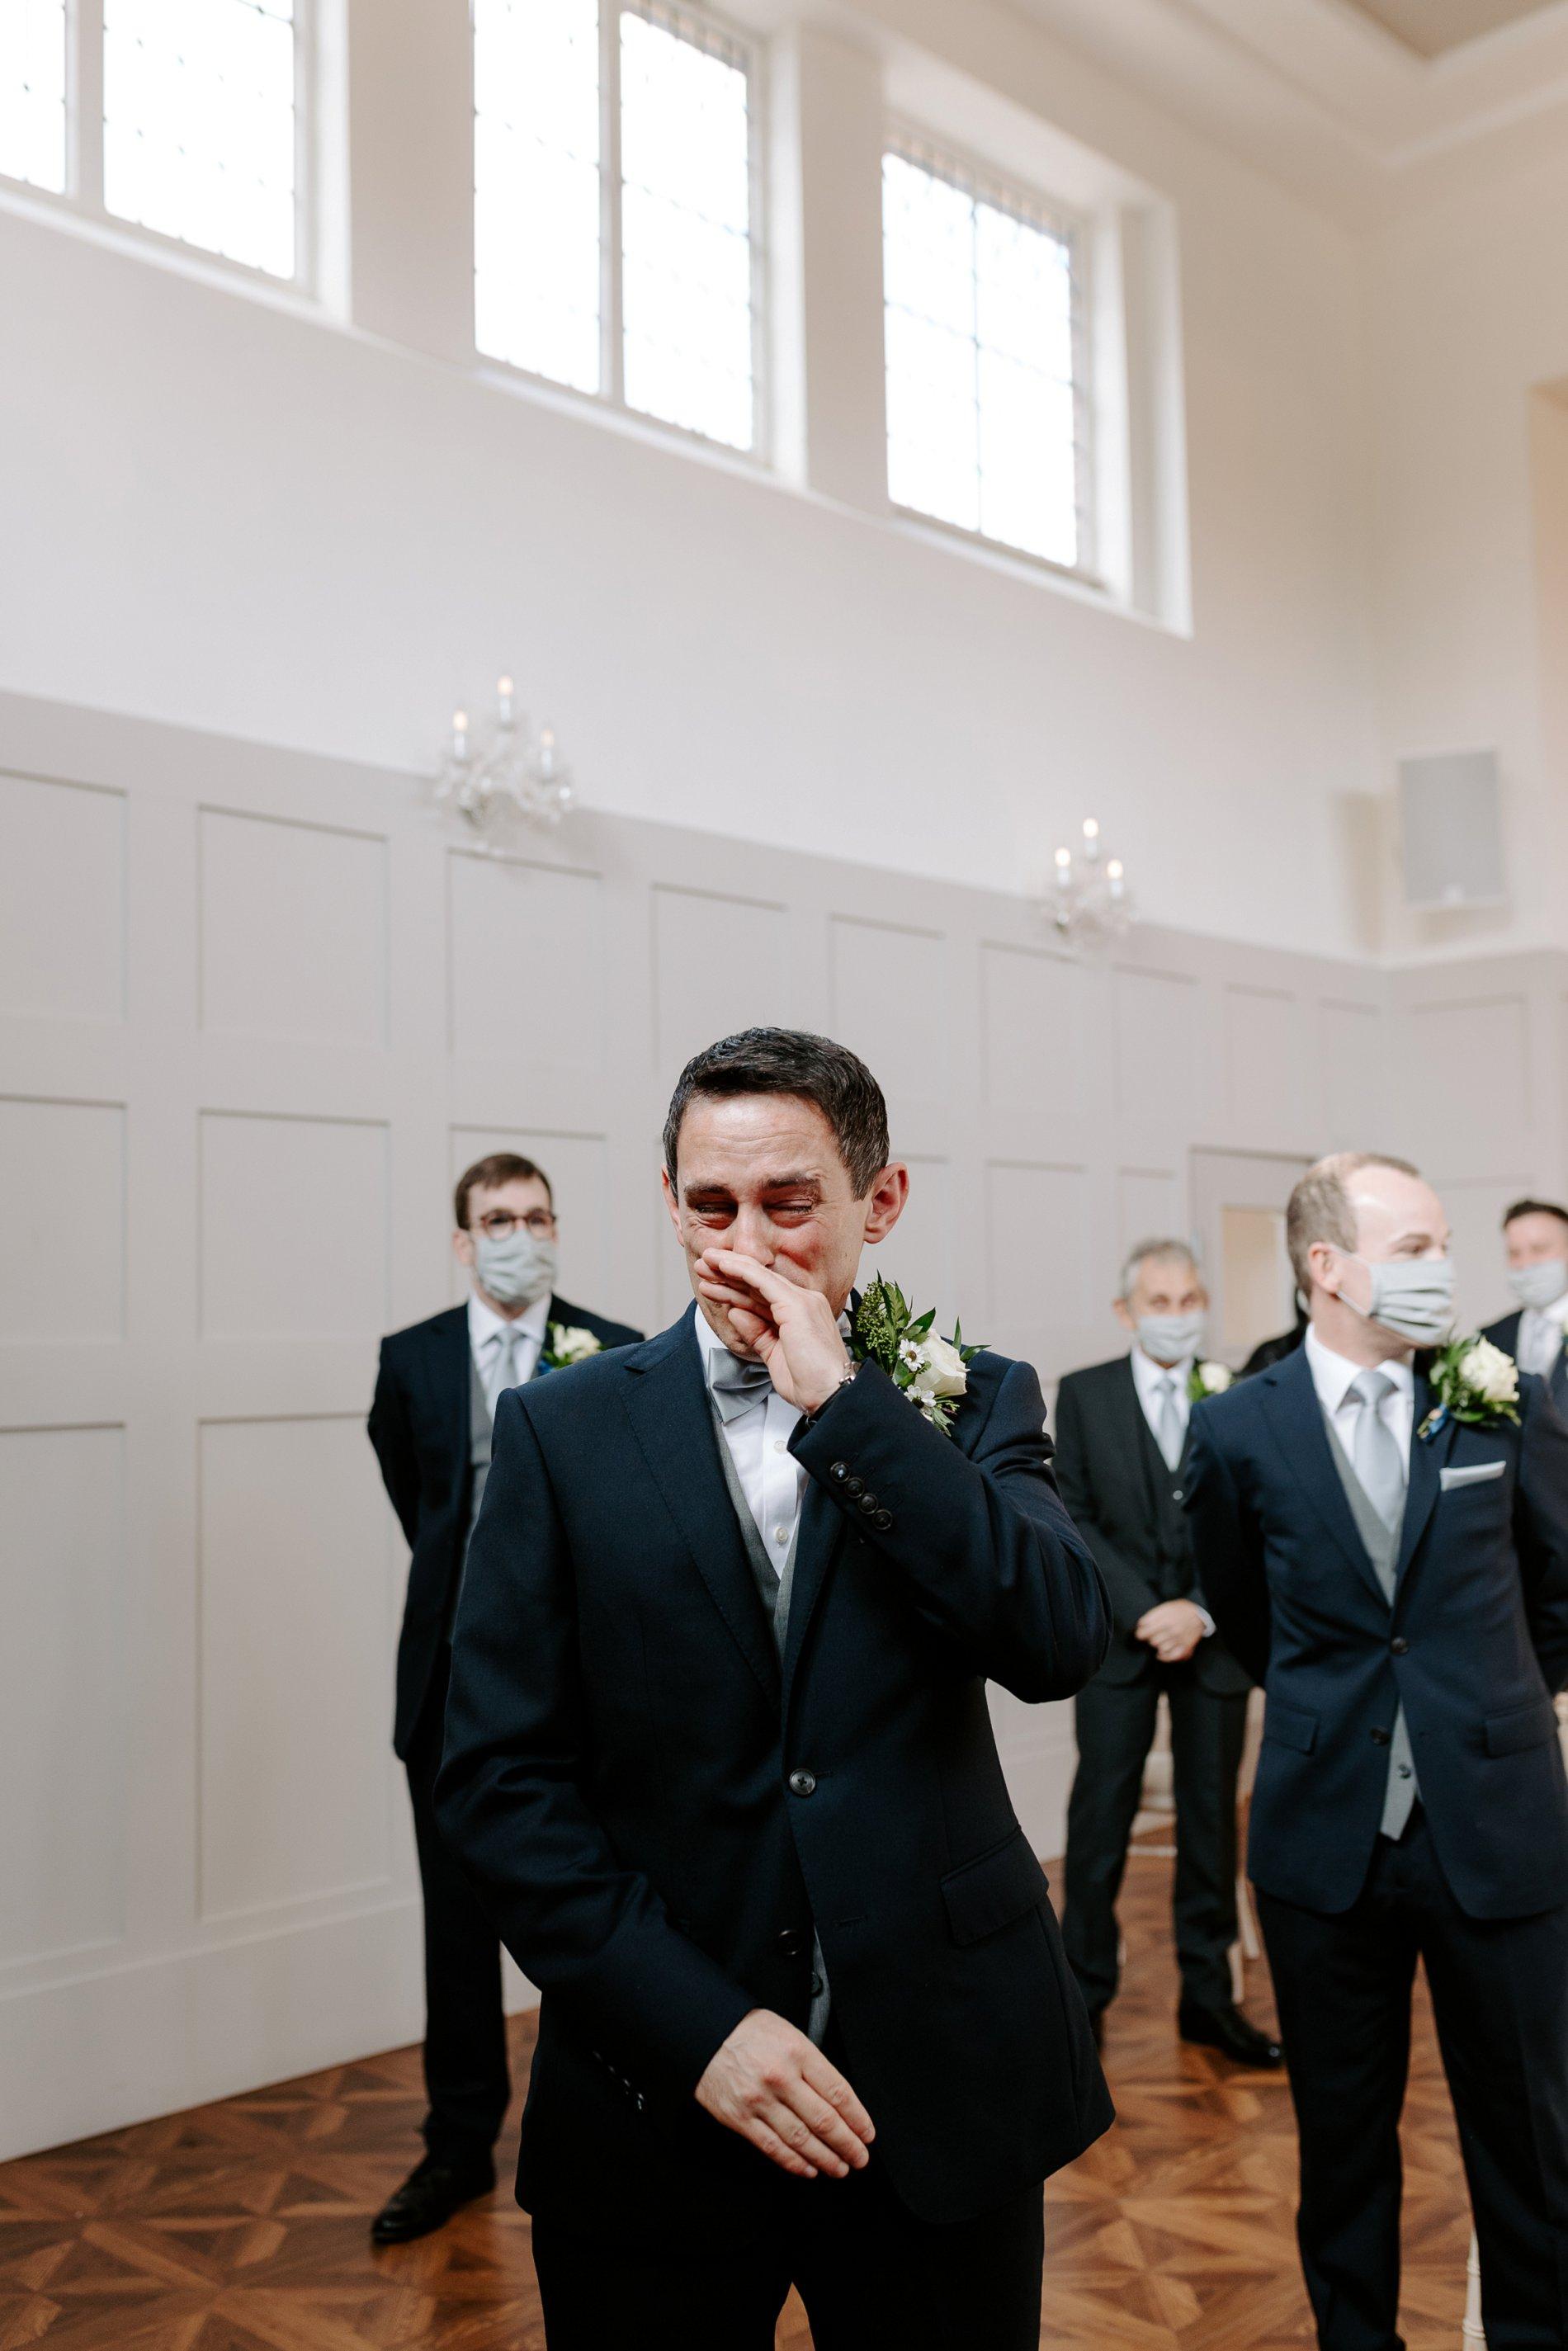 An Elegant White Wedding at Thicket Priory (c) Carla Whittingham Photography (34)